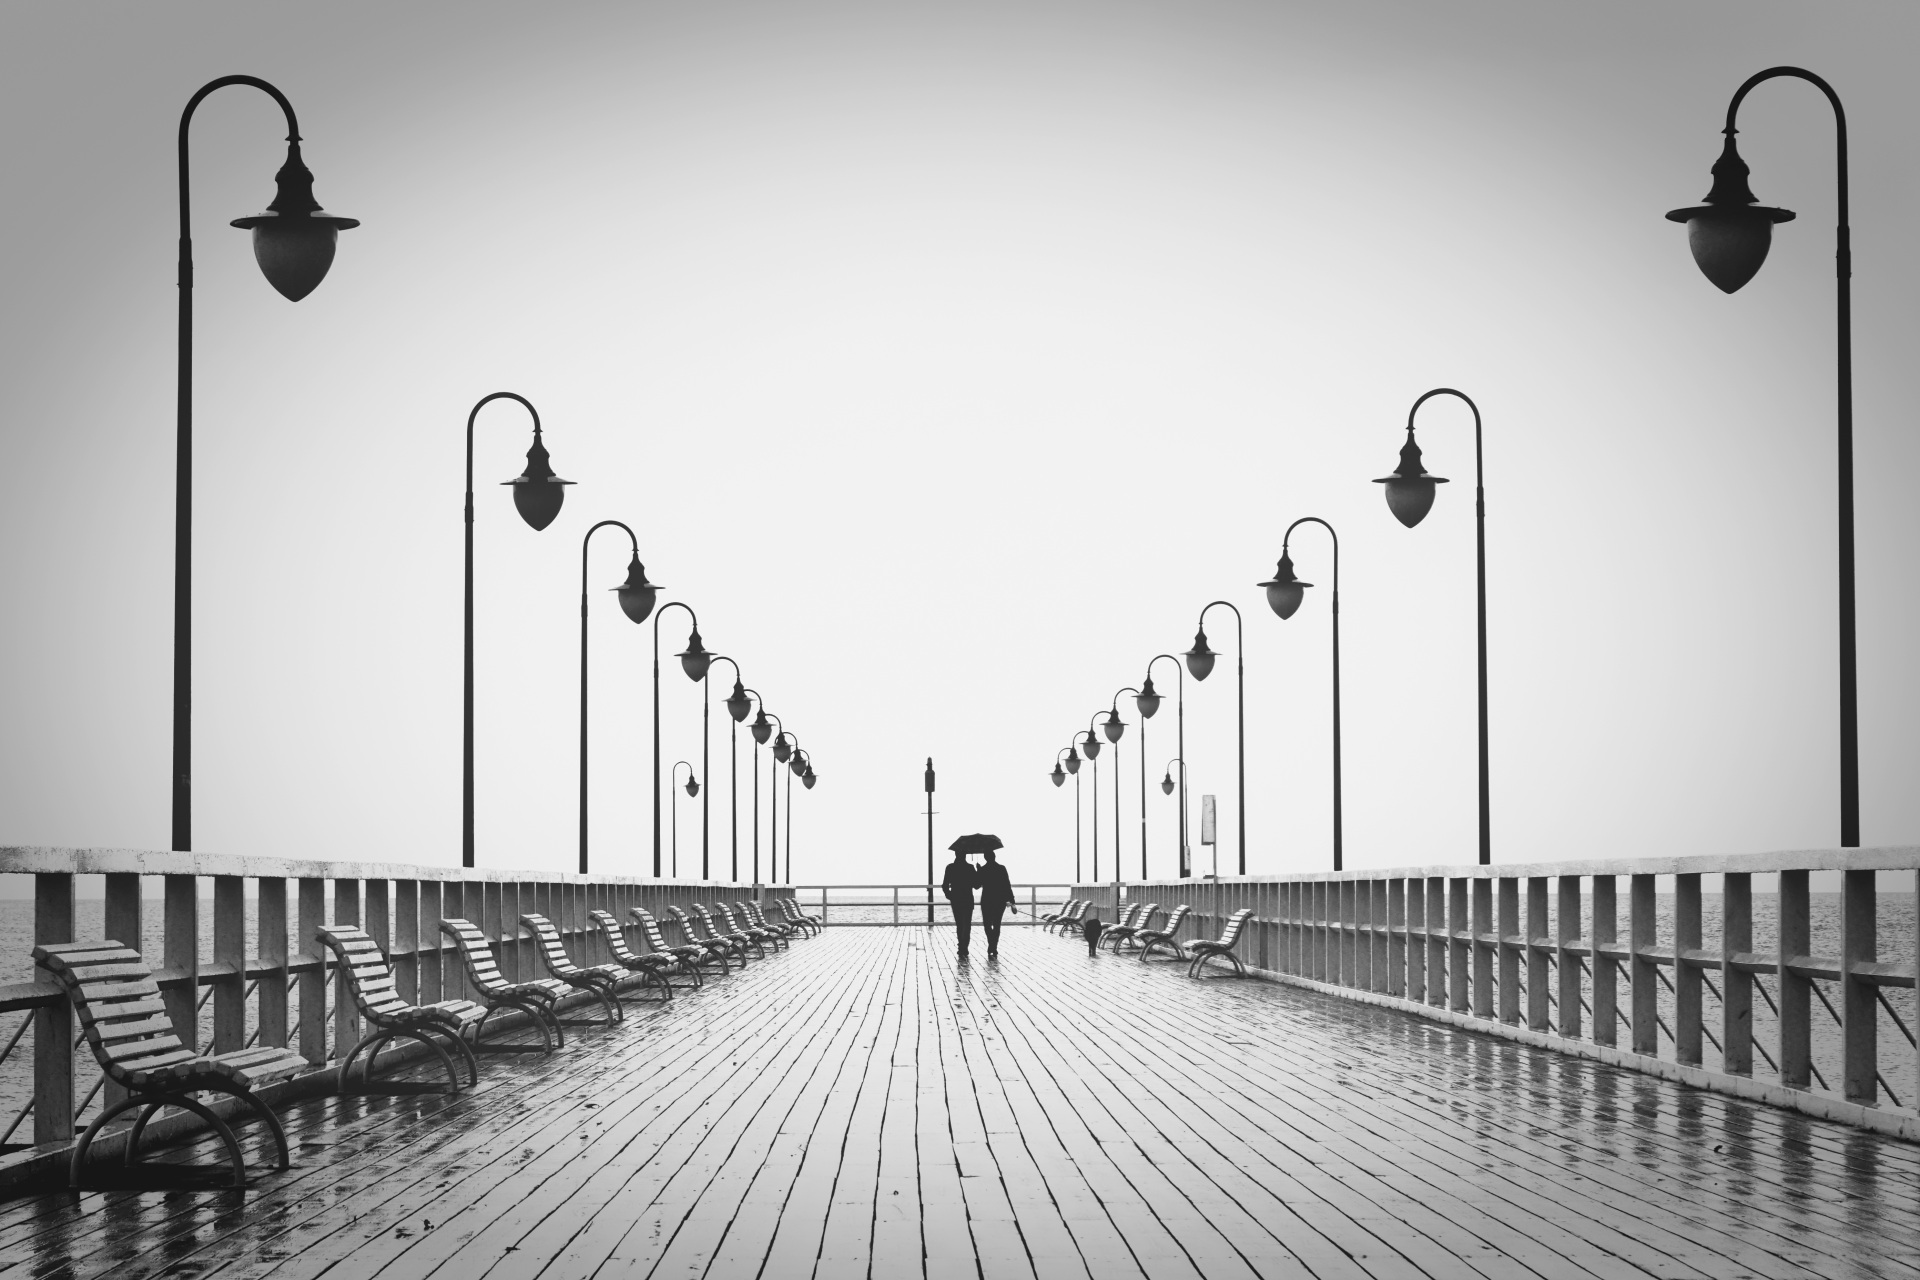 Two people walking on a pier in the rain.